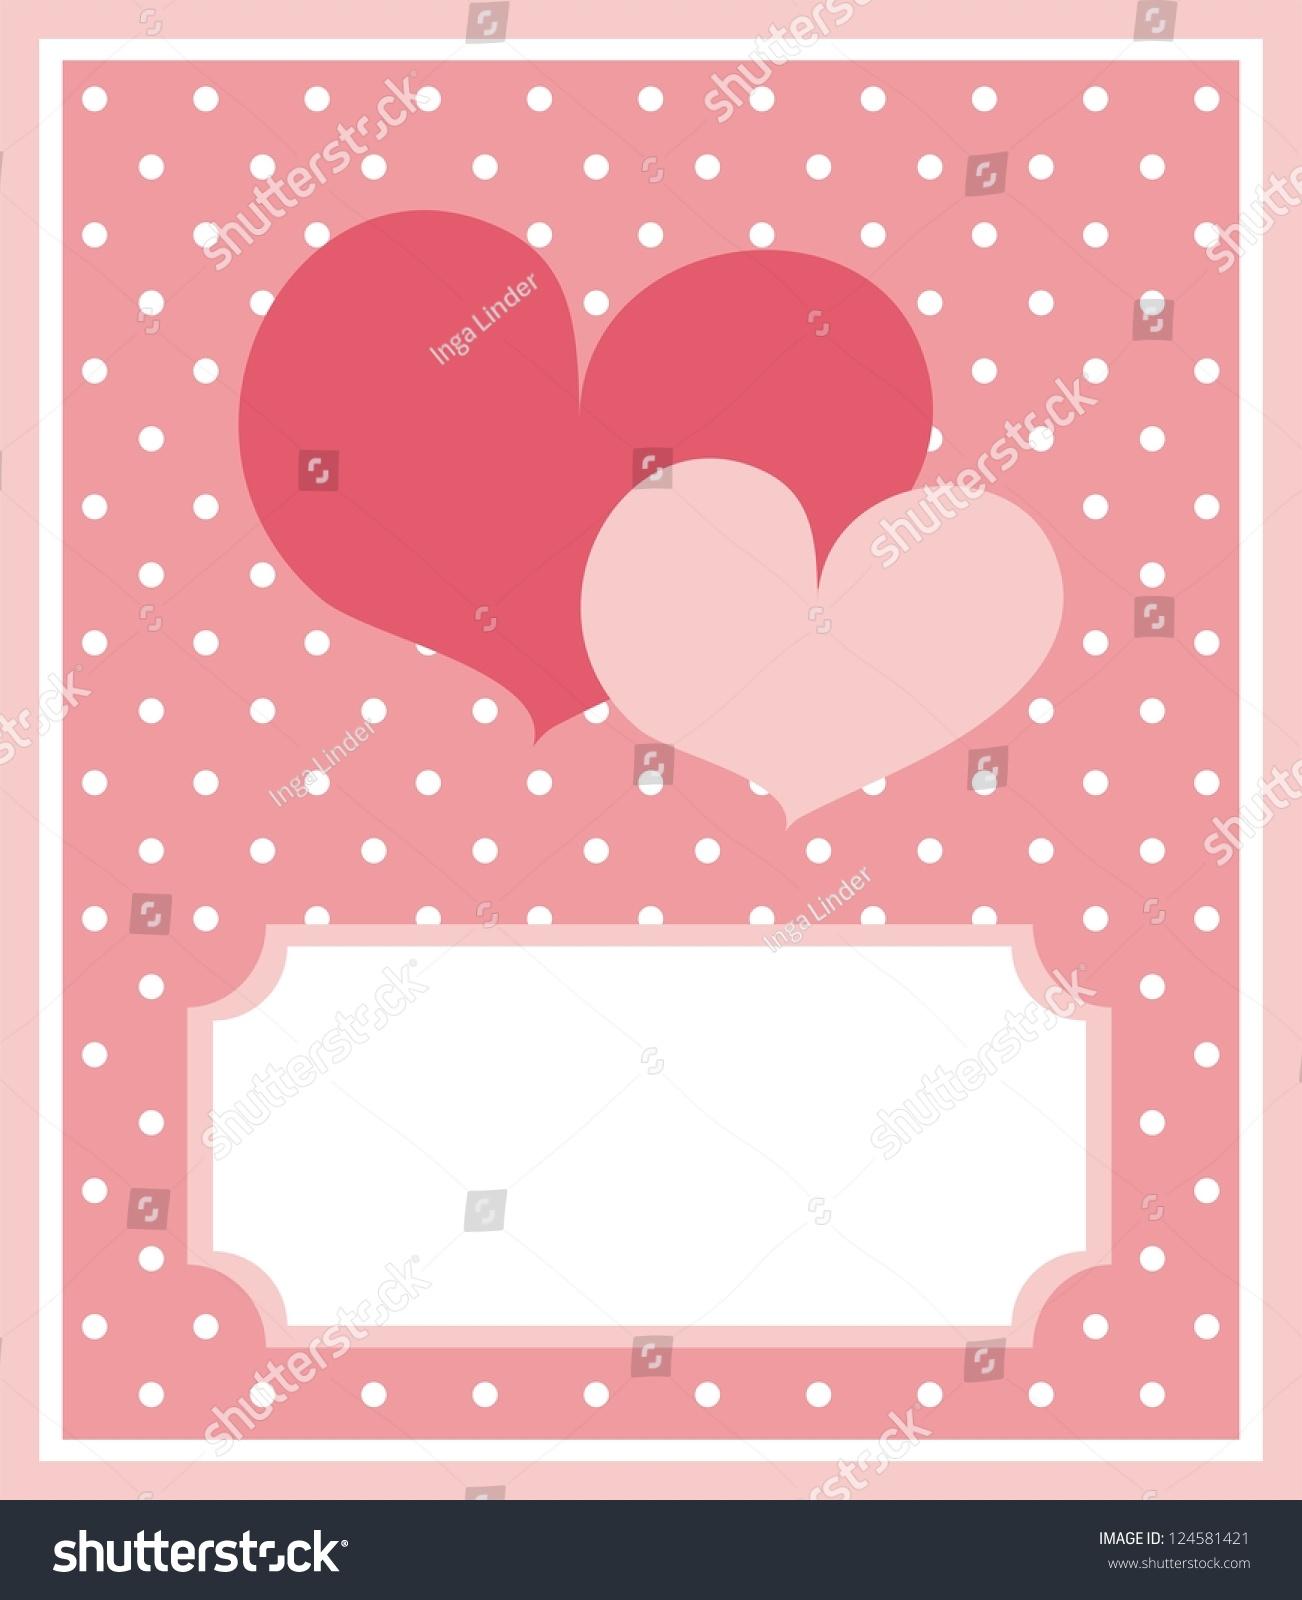 Cute Valentines Card Wedding Invitation Red Illustration – Valentine Card Background